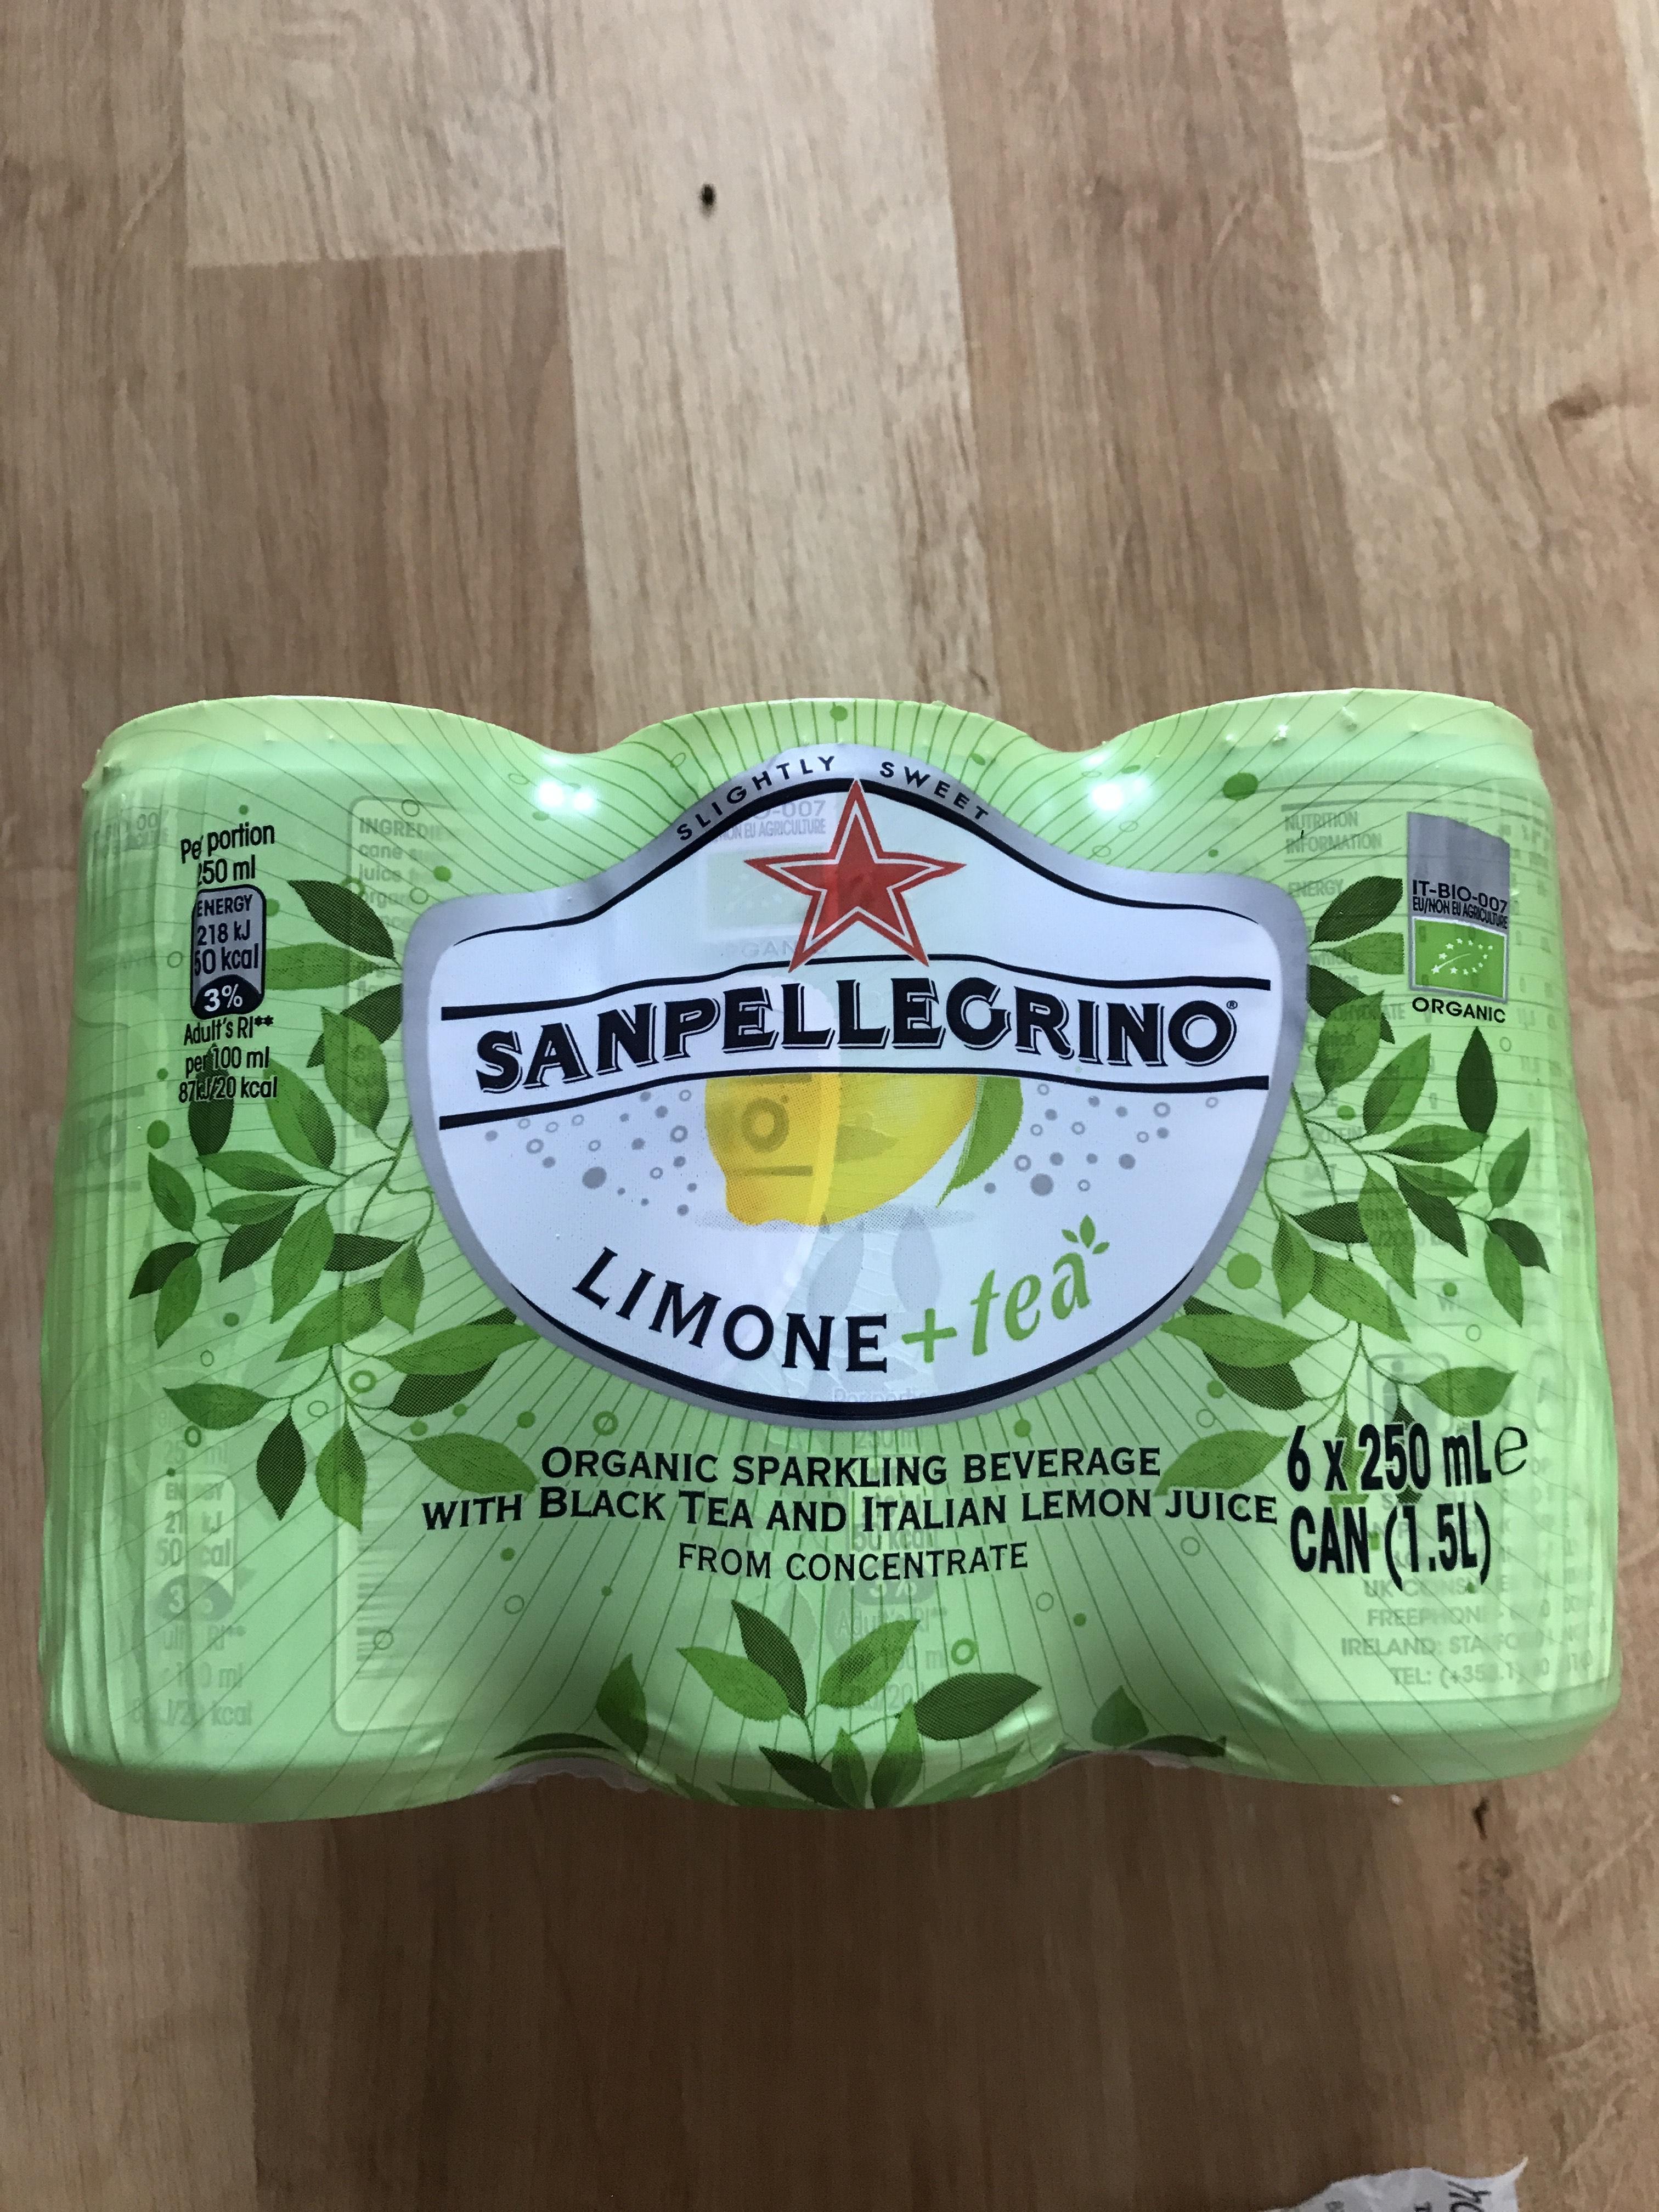 San Pellegrino sparkling Organic Lemon Tea. 6 x 250ml. £1.29 at Home Bargains (Cardiff)